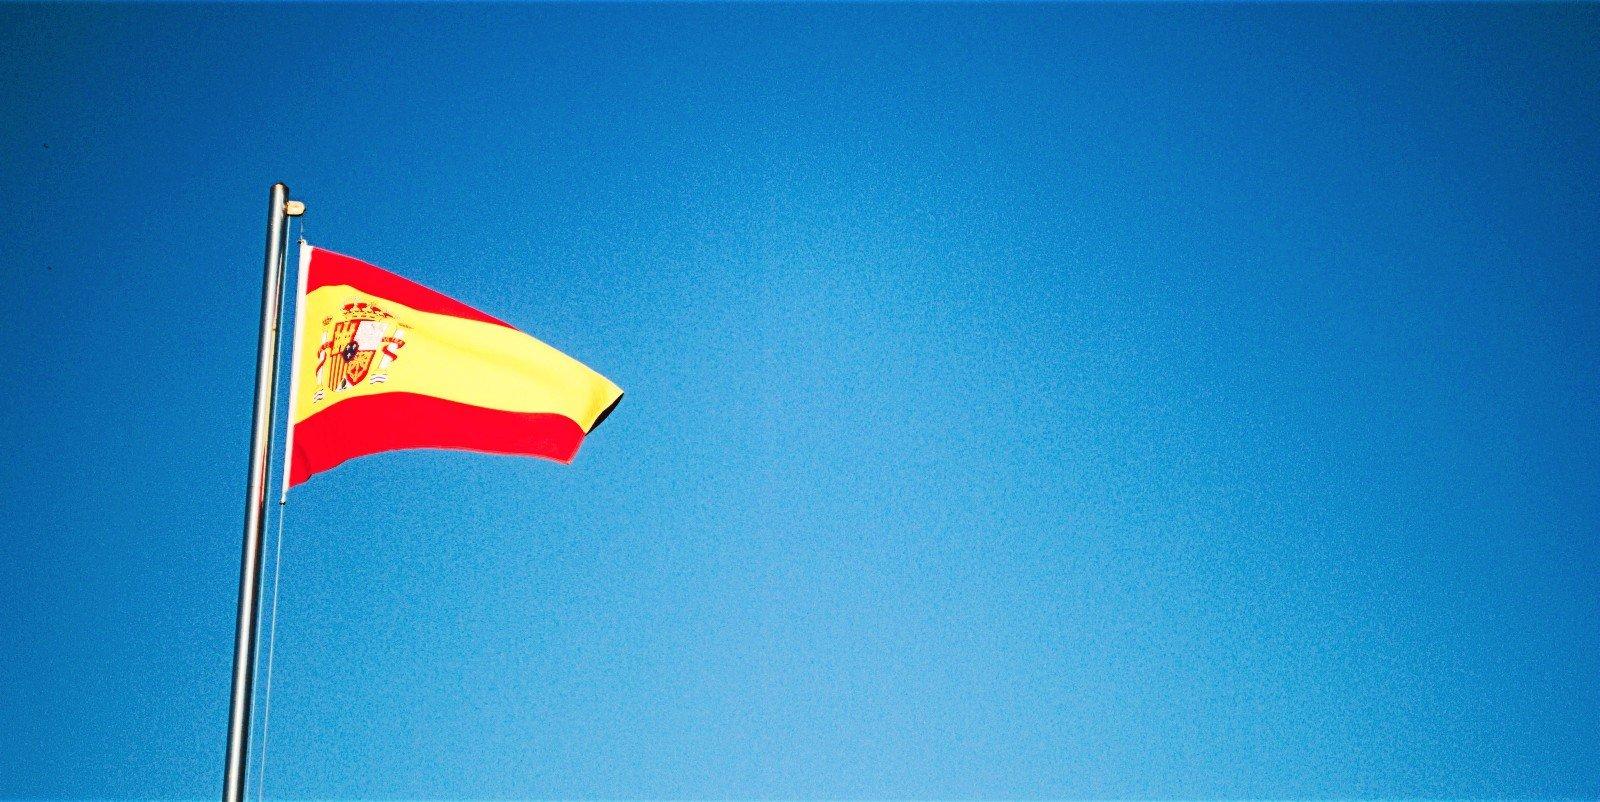 Ryuk ransomware hits Spanish government labor agency